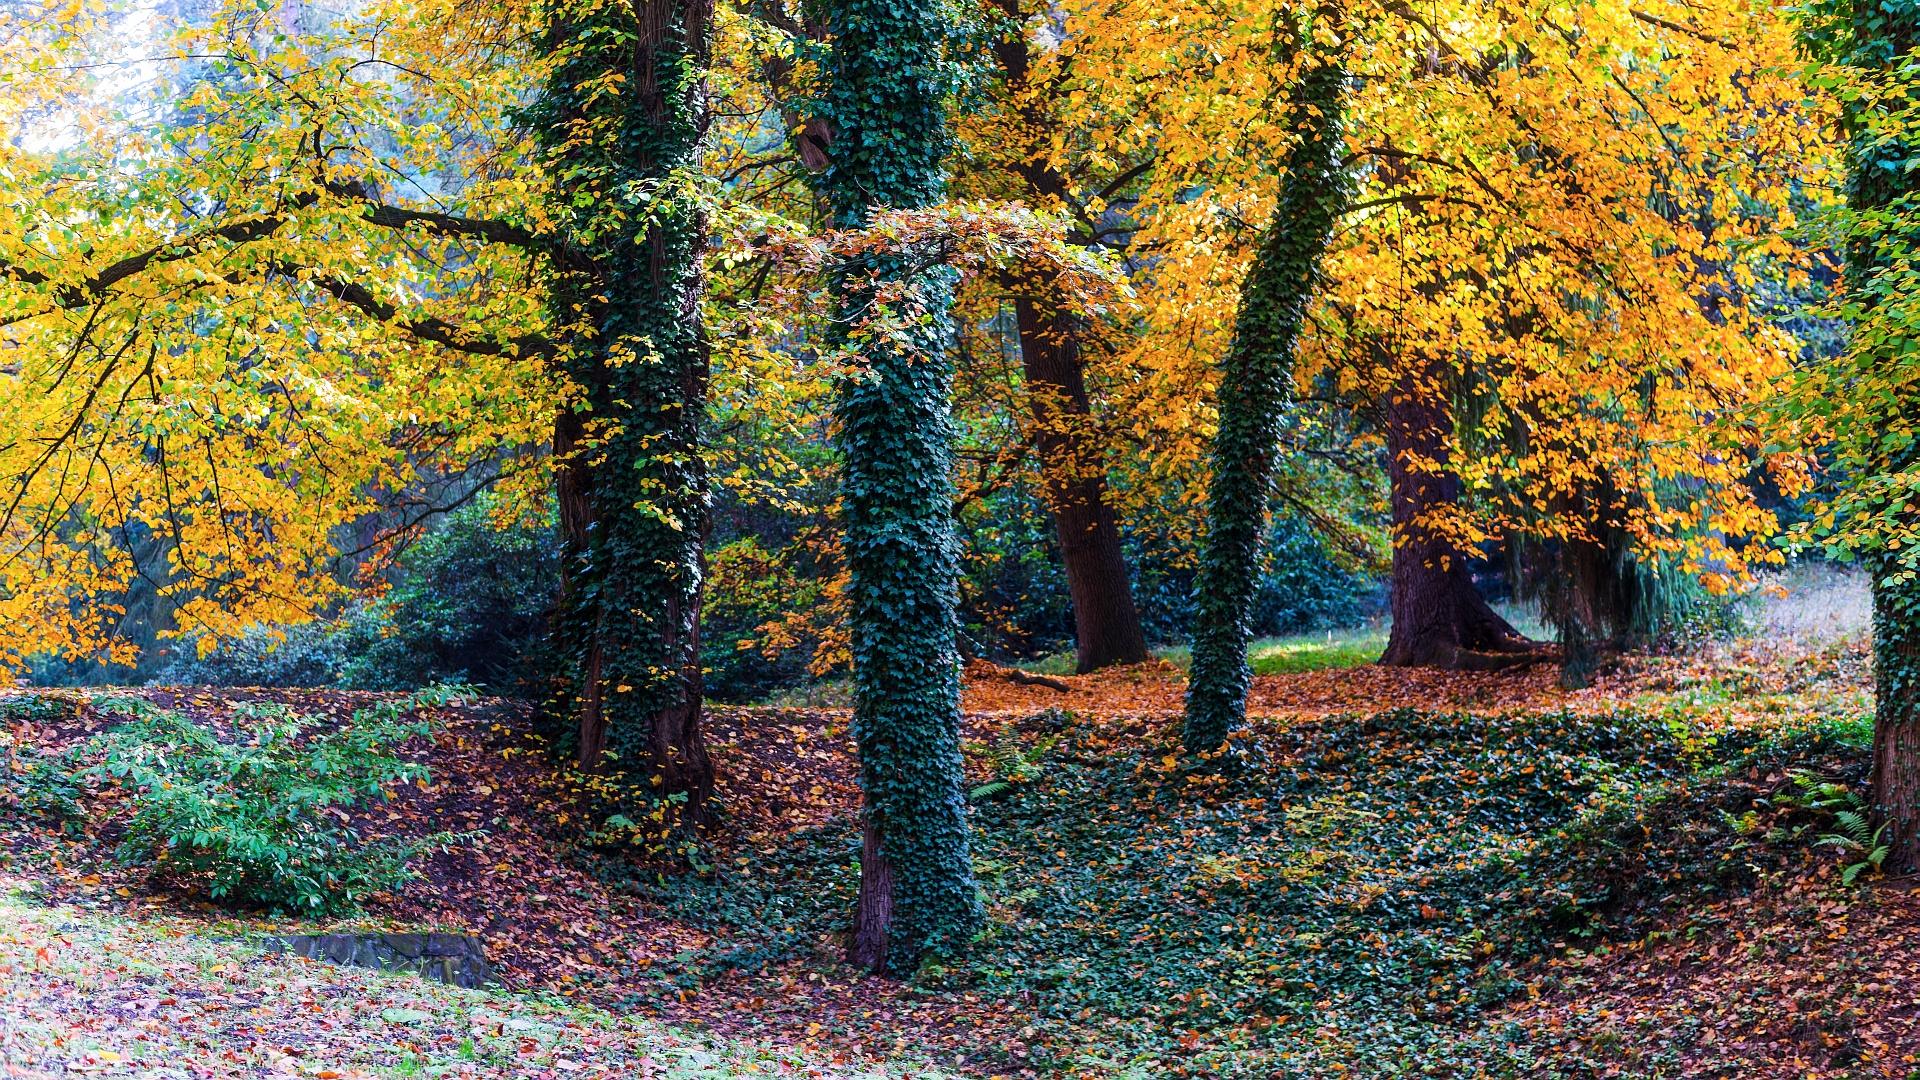 The Wood's Autumn Skin